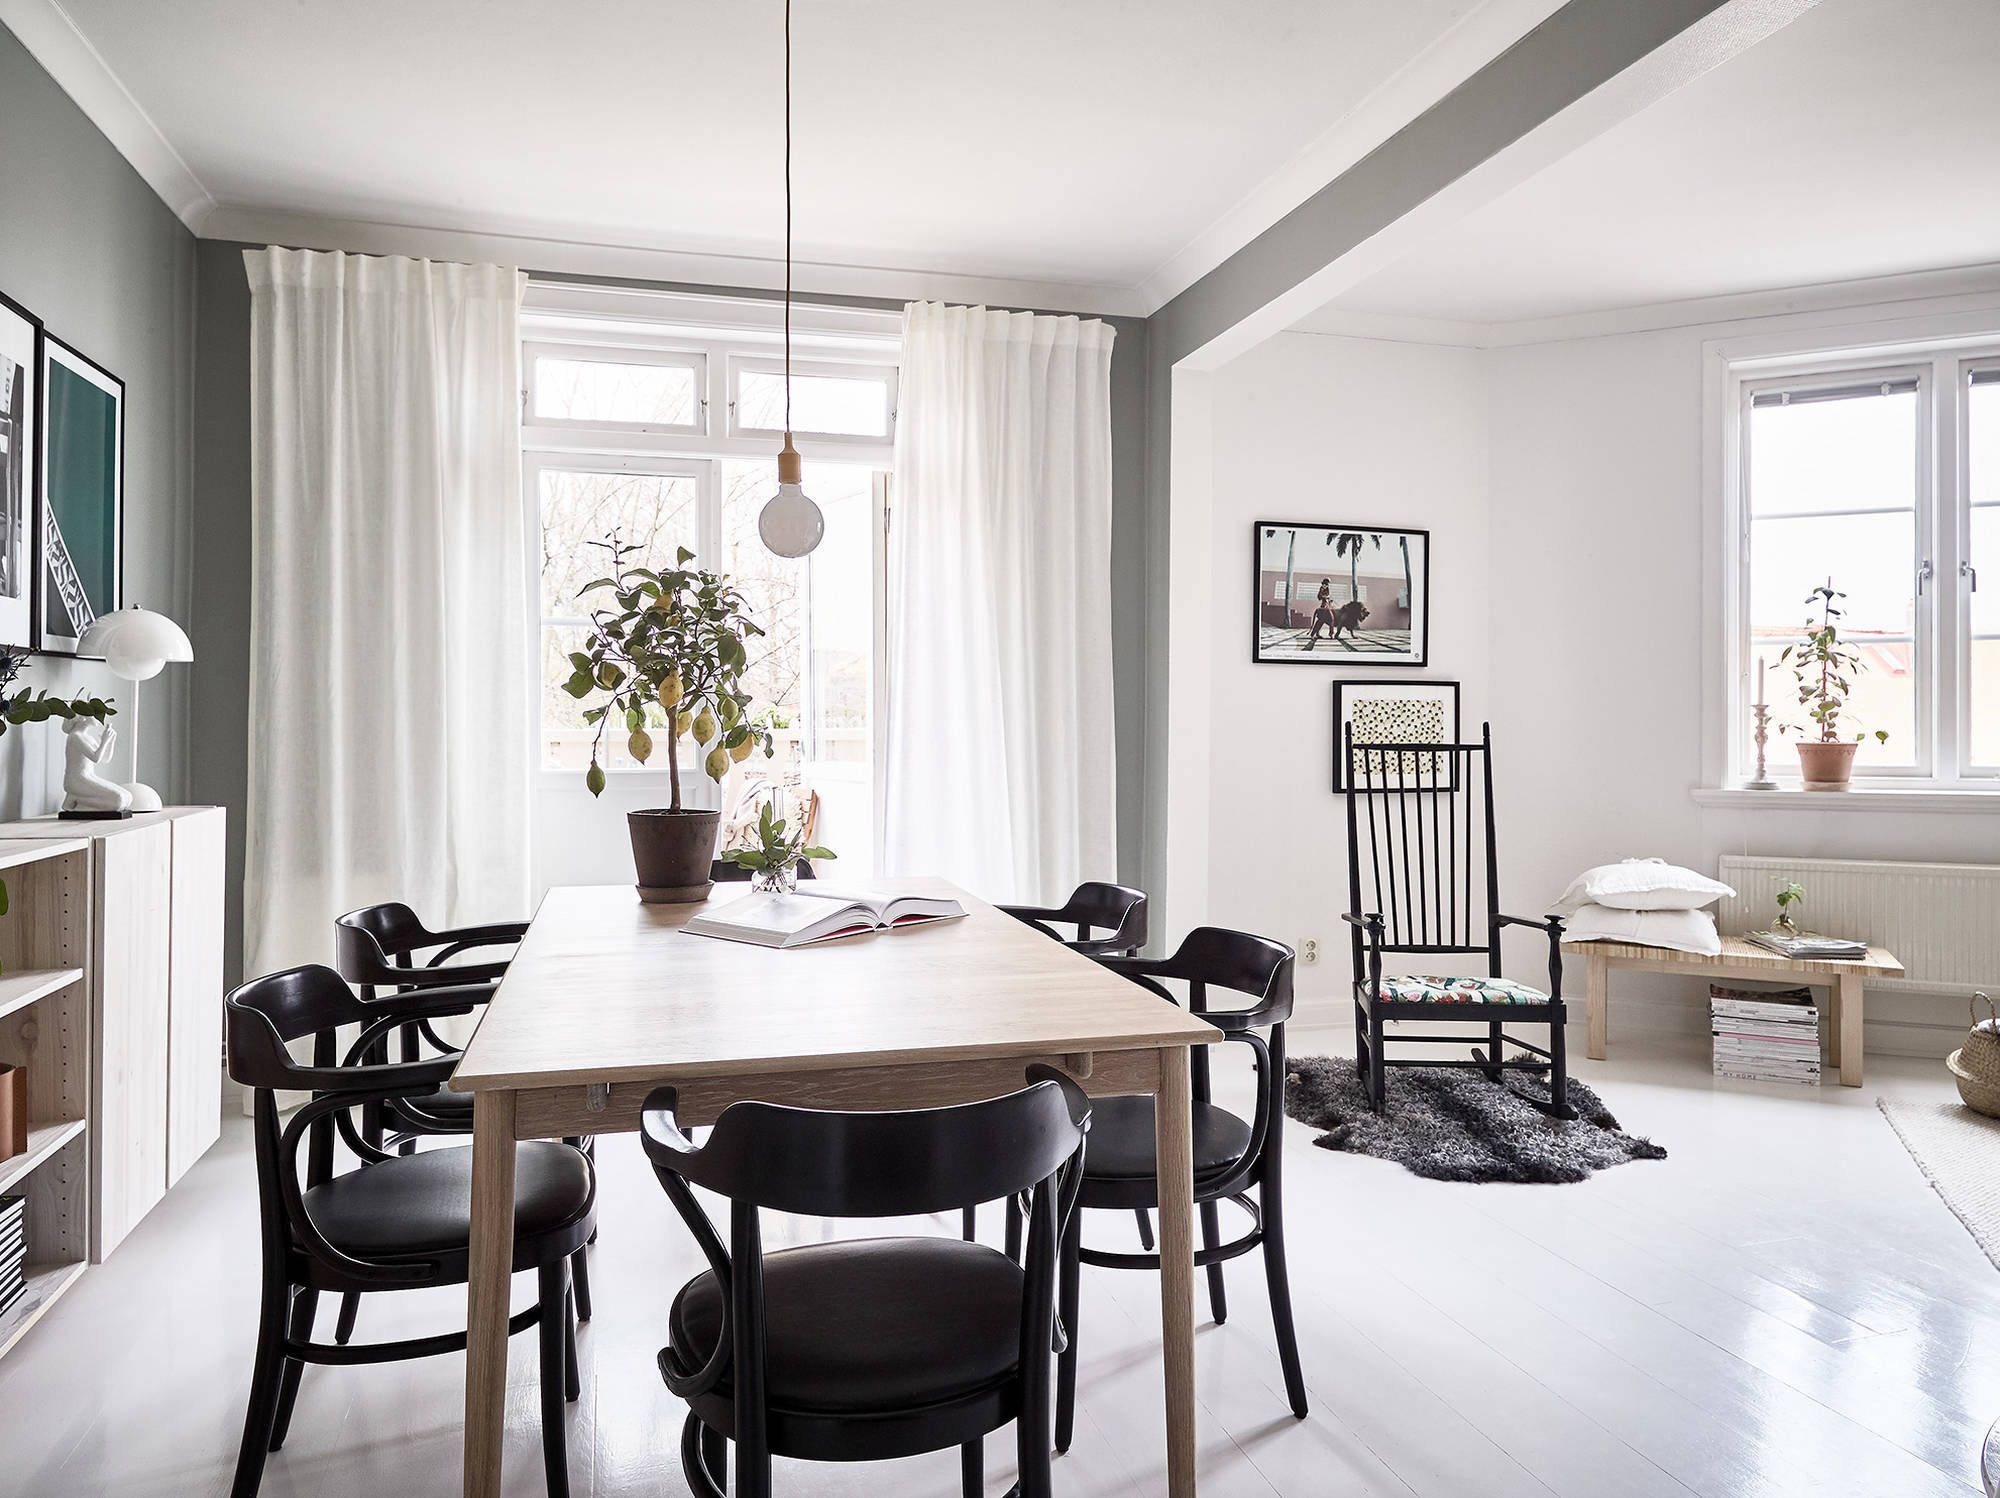 Home Decor Ideas And Trends At My Design Agenda Decoraciones De